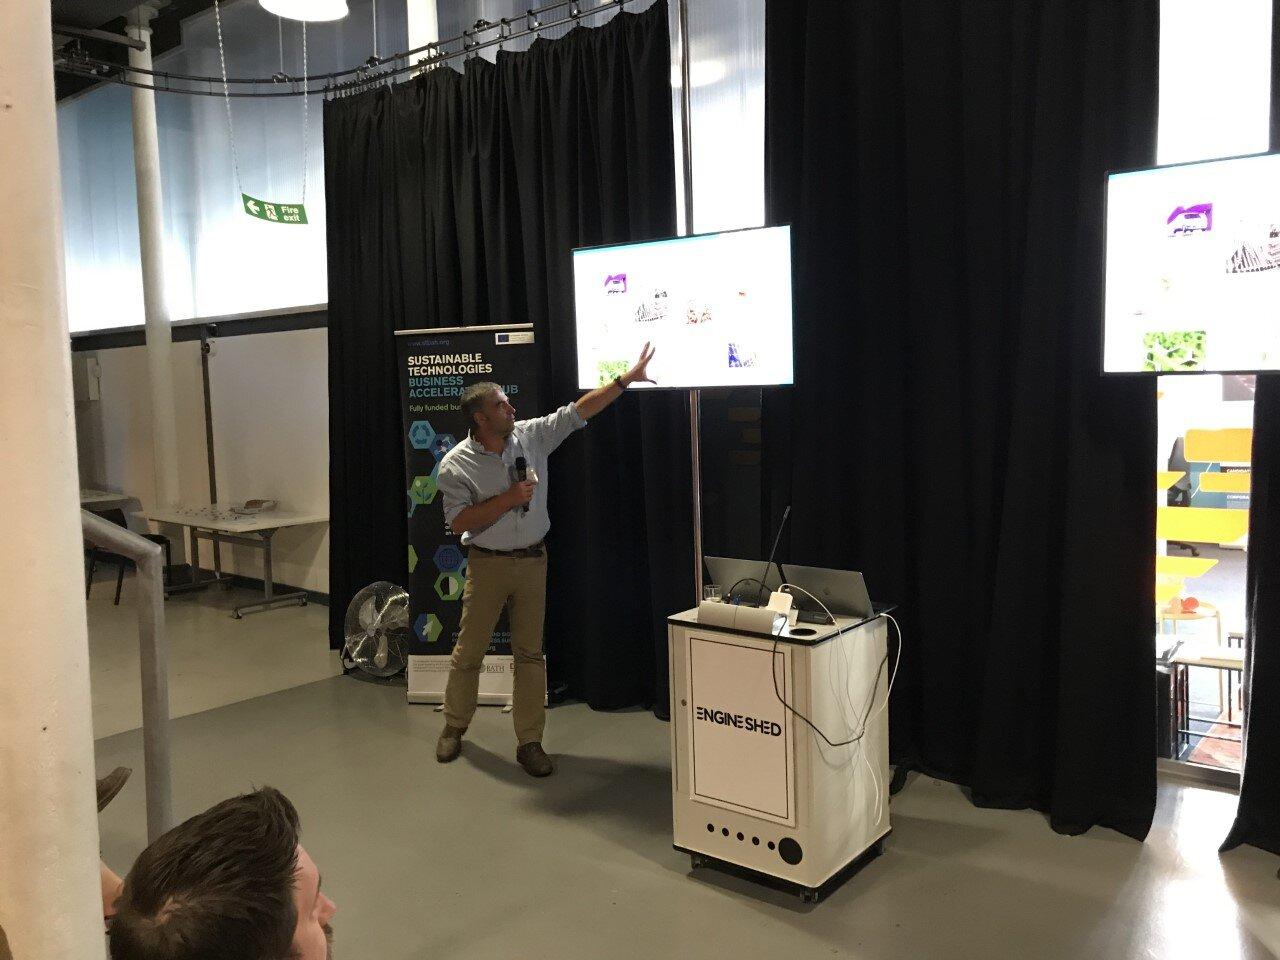 Professor Matthew Davidson, CSCT, University of Bath presents on Bio-Based Plastics and the circular economy